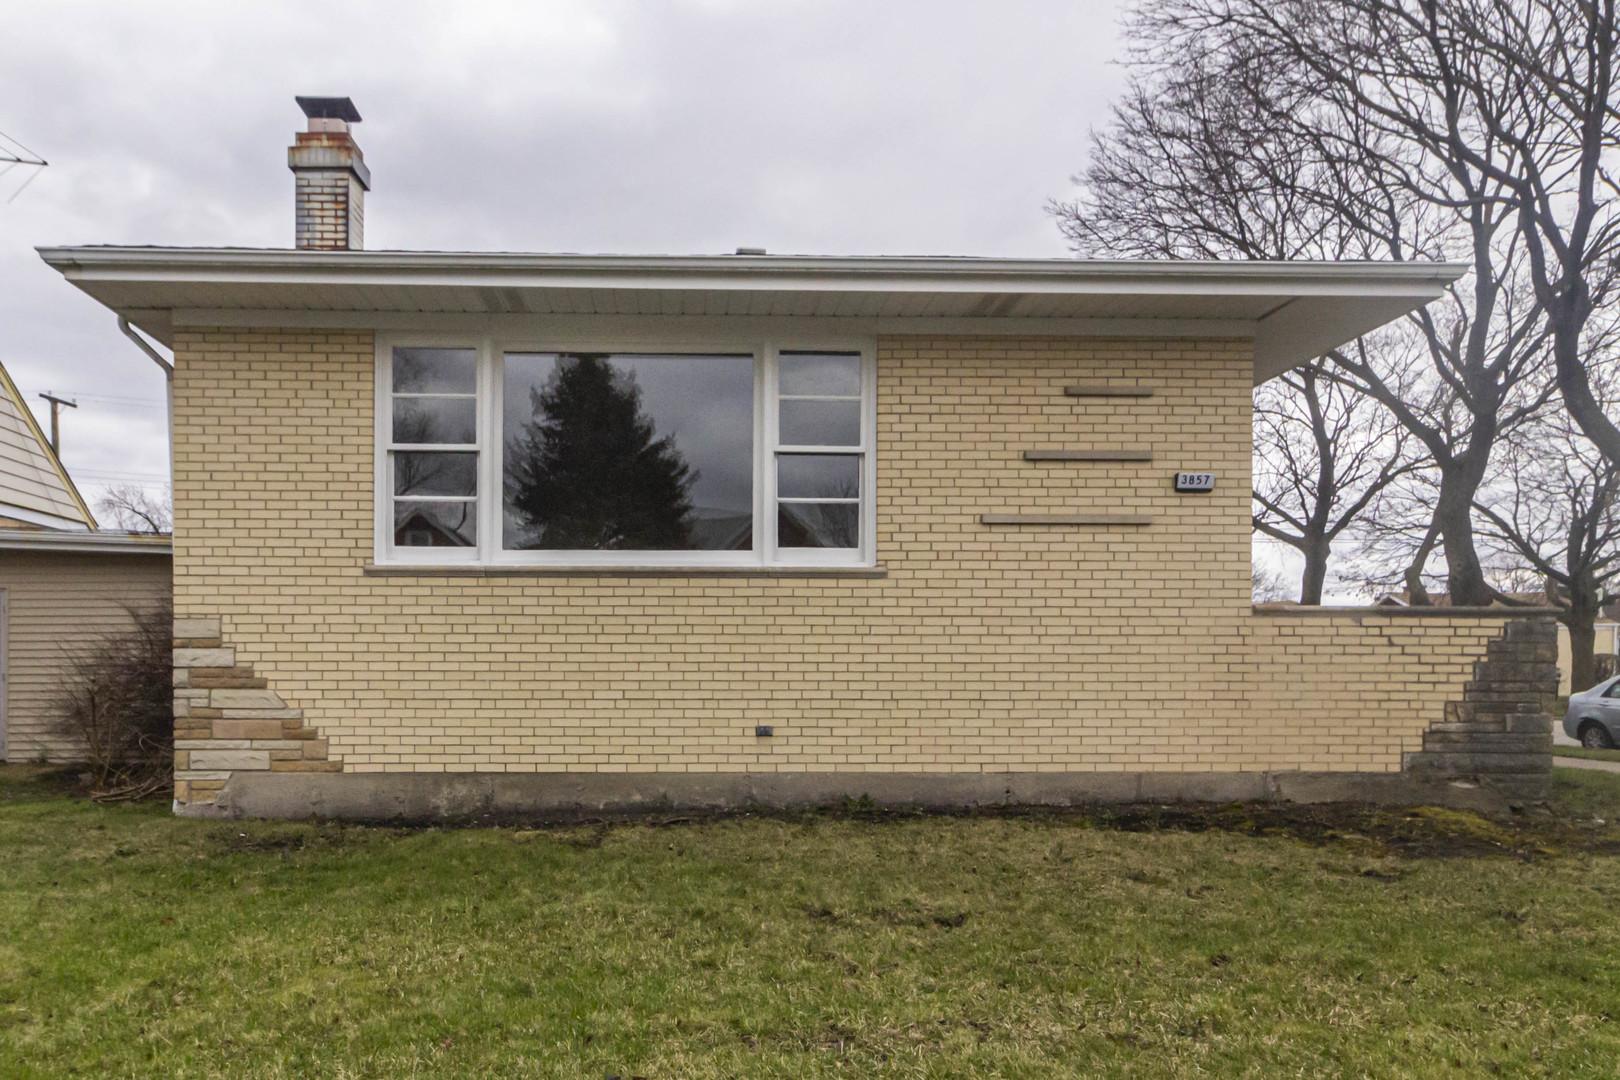 3857 W 83rd Exterior Photo